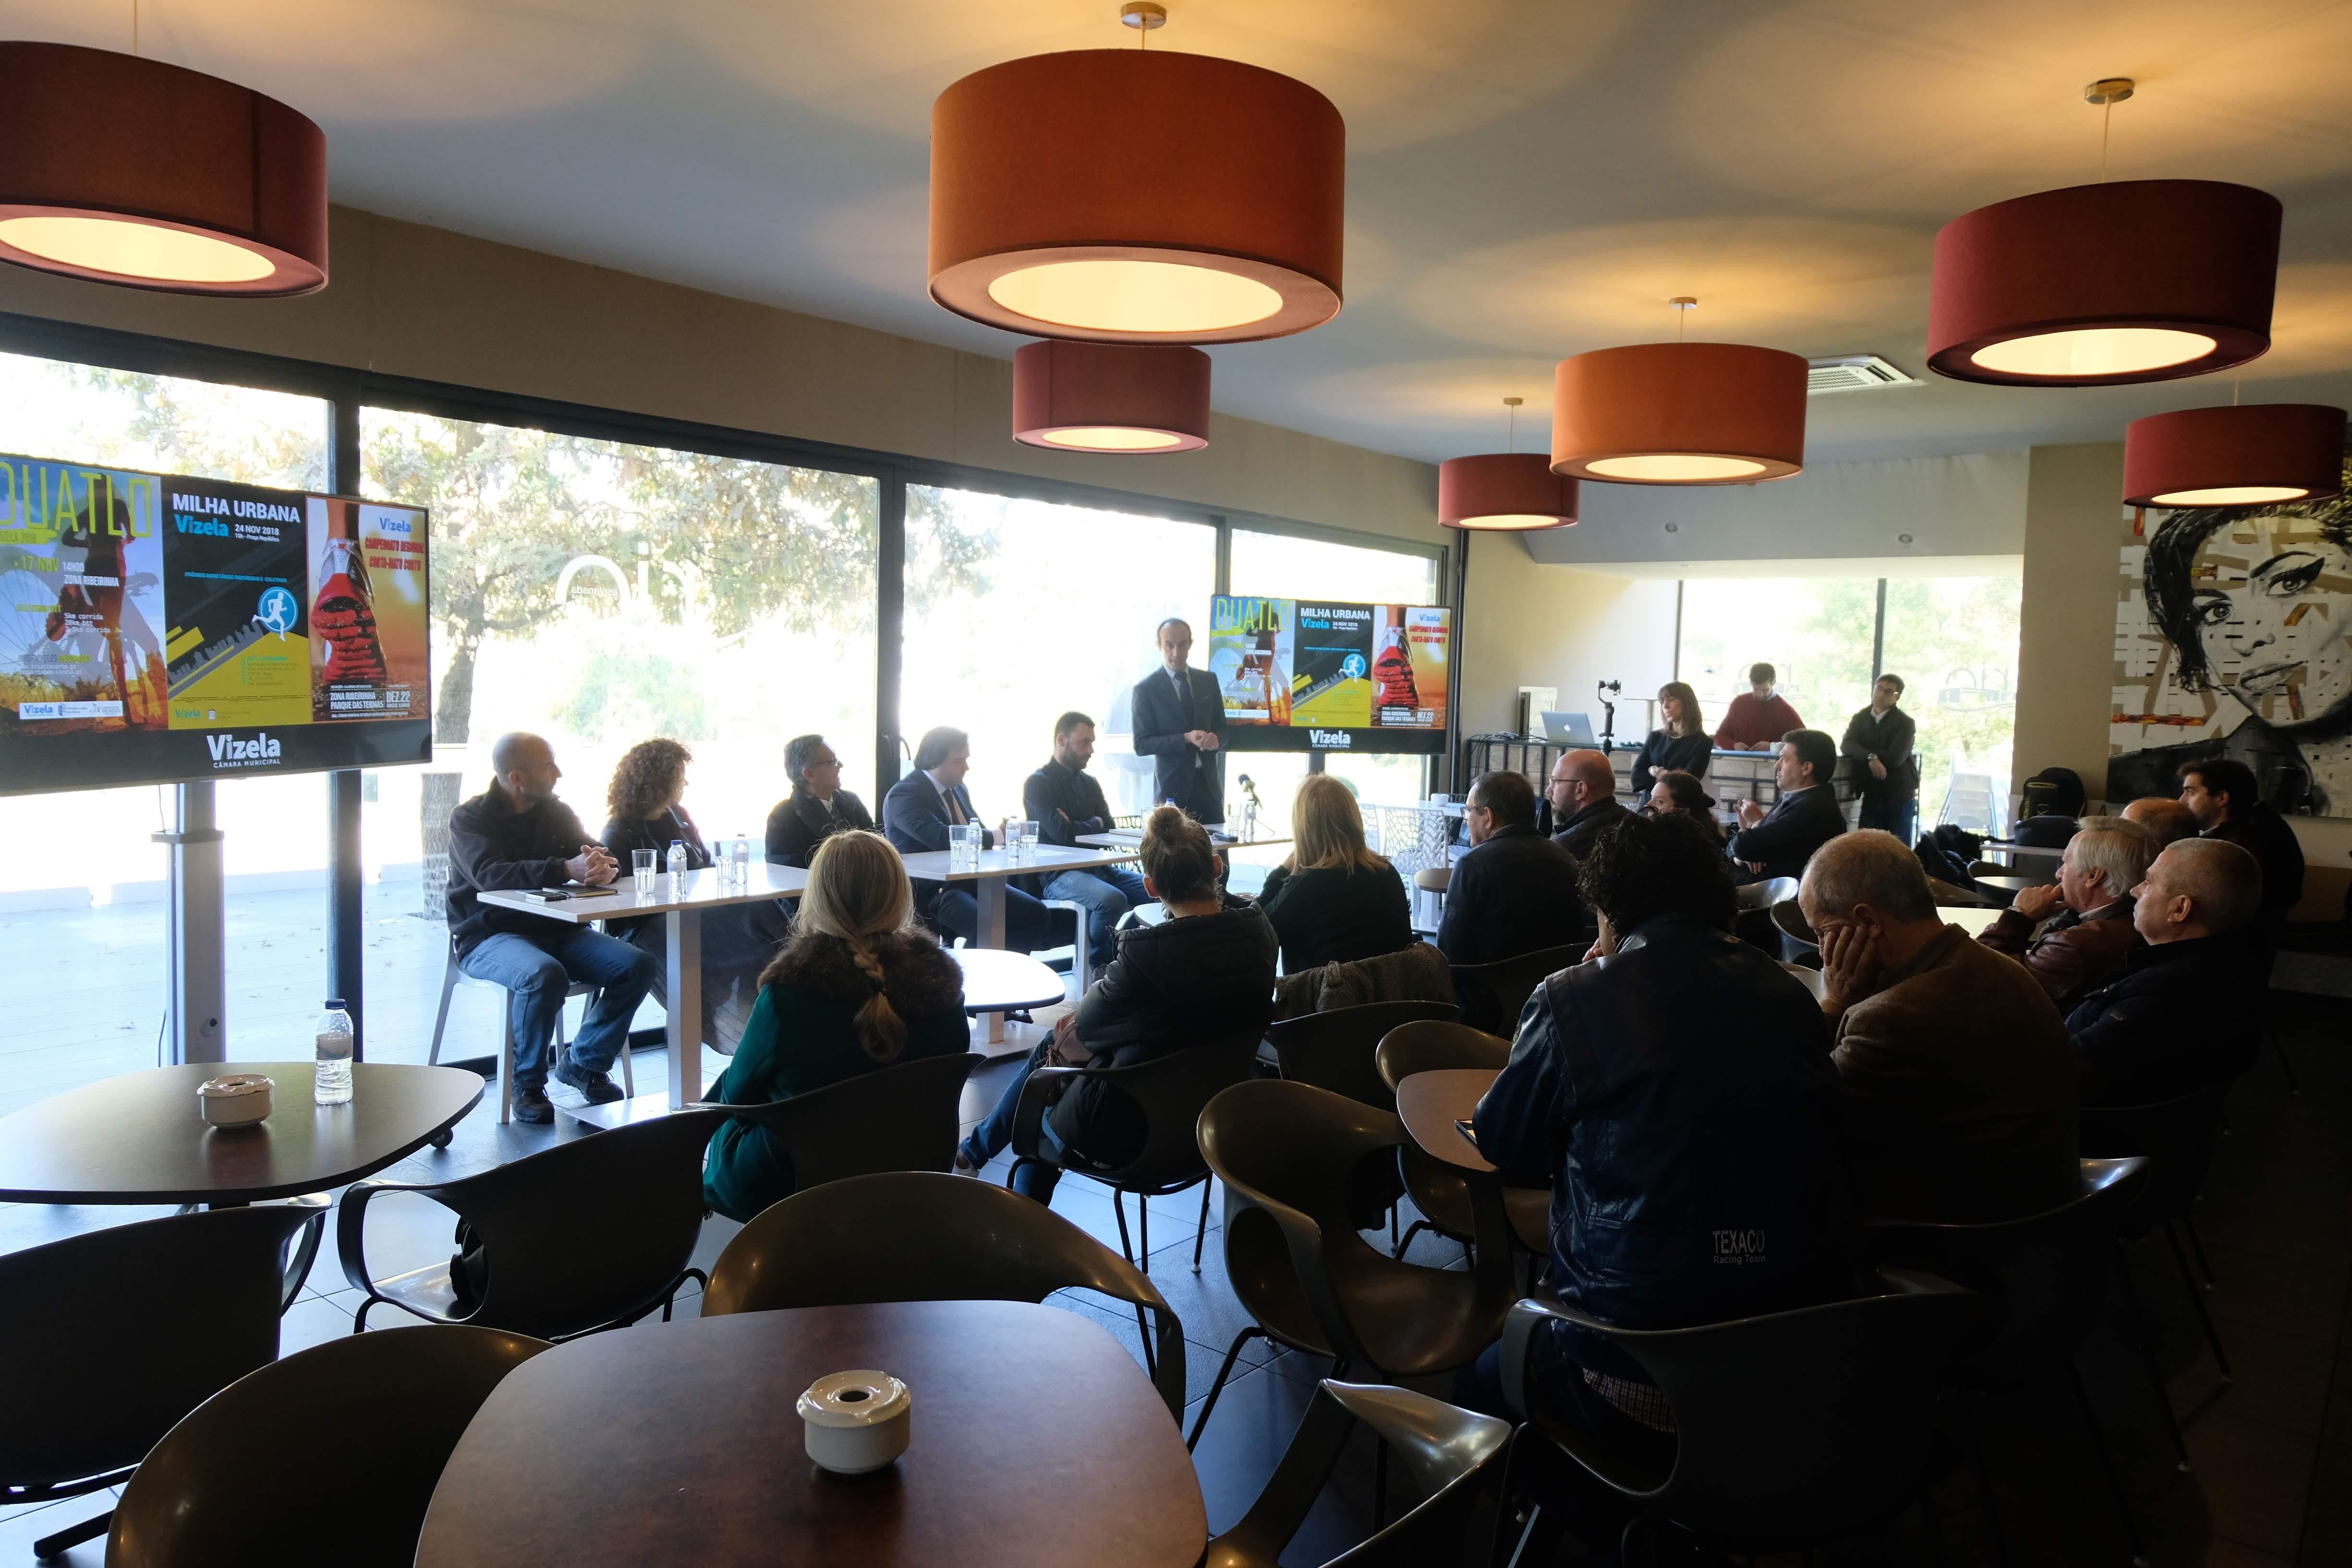 Câmara apresentou Duatlo, Milha Urbana e Corta-Mato Curto